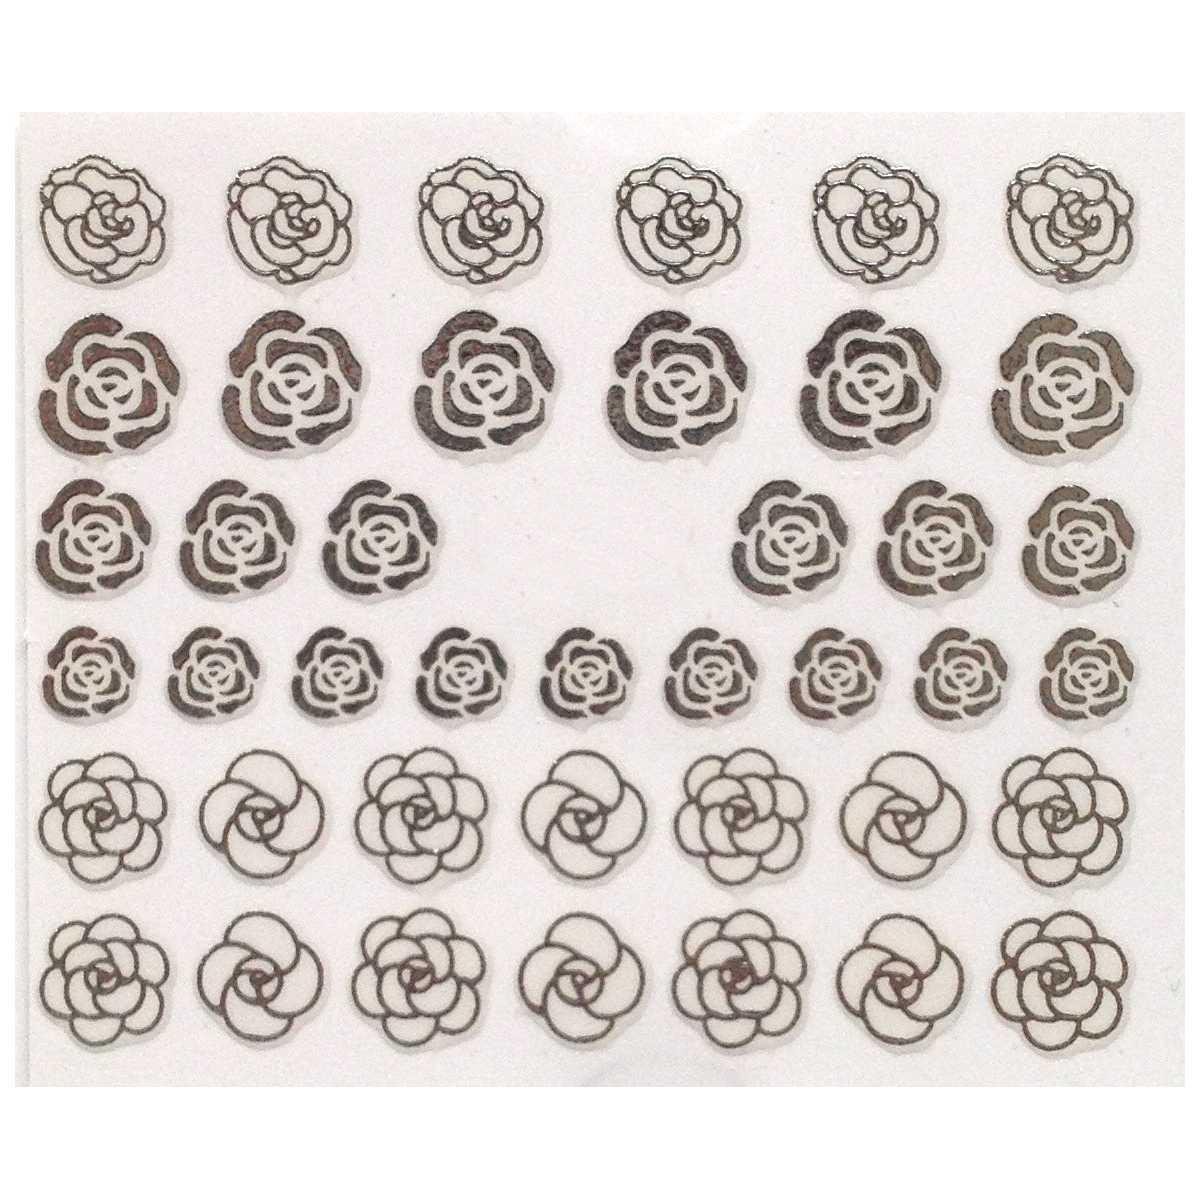 https://www.kit-manucure.com/578-thickbox_default/stickers-ongles-nail-art-fleur-rose-argenté.jpg